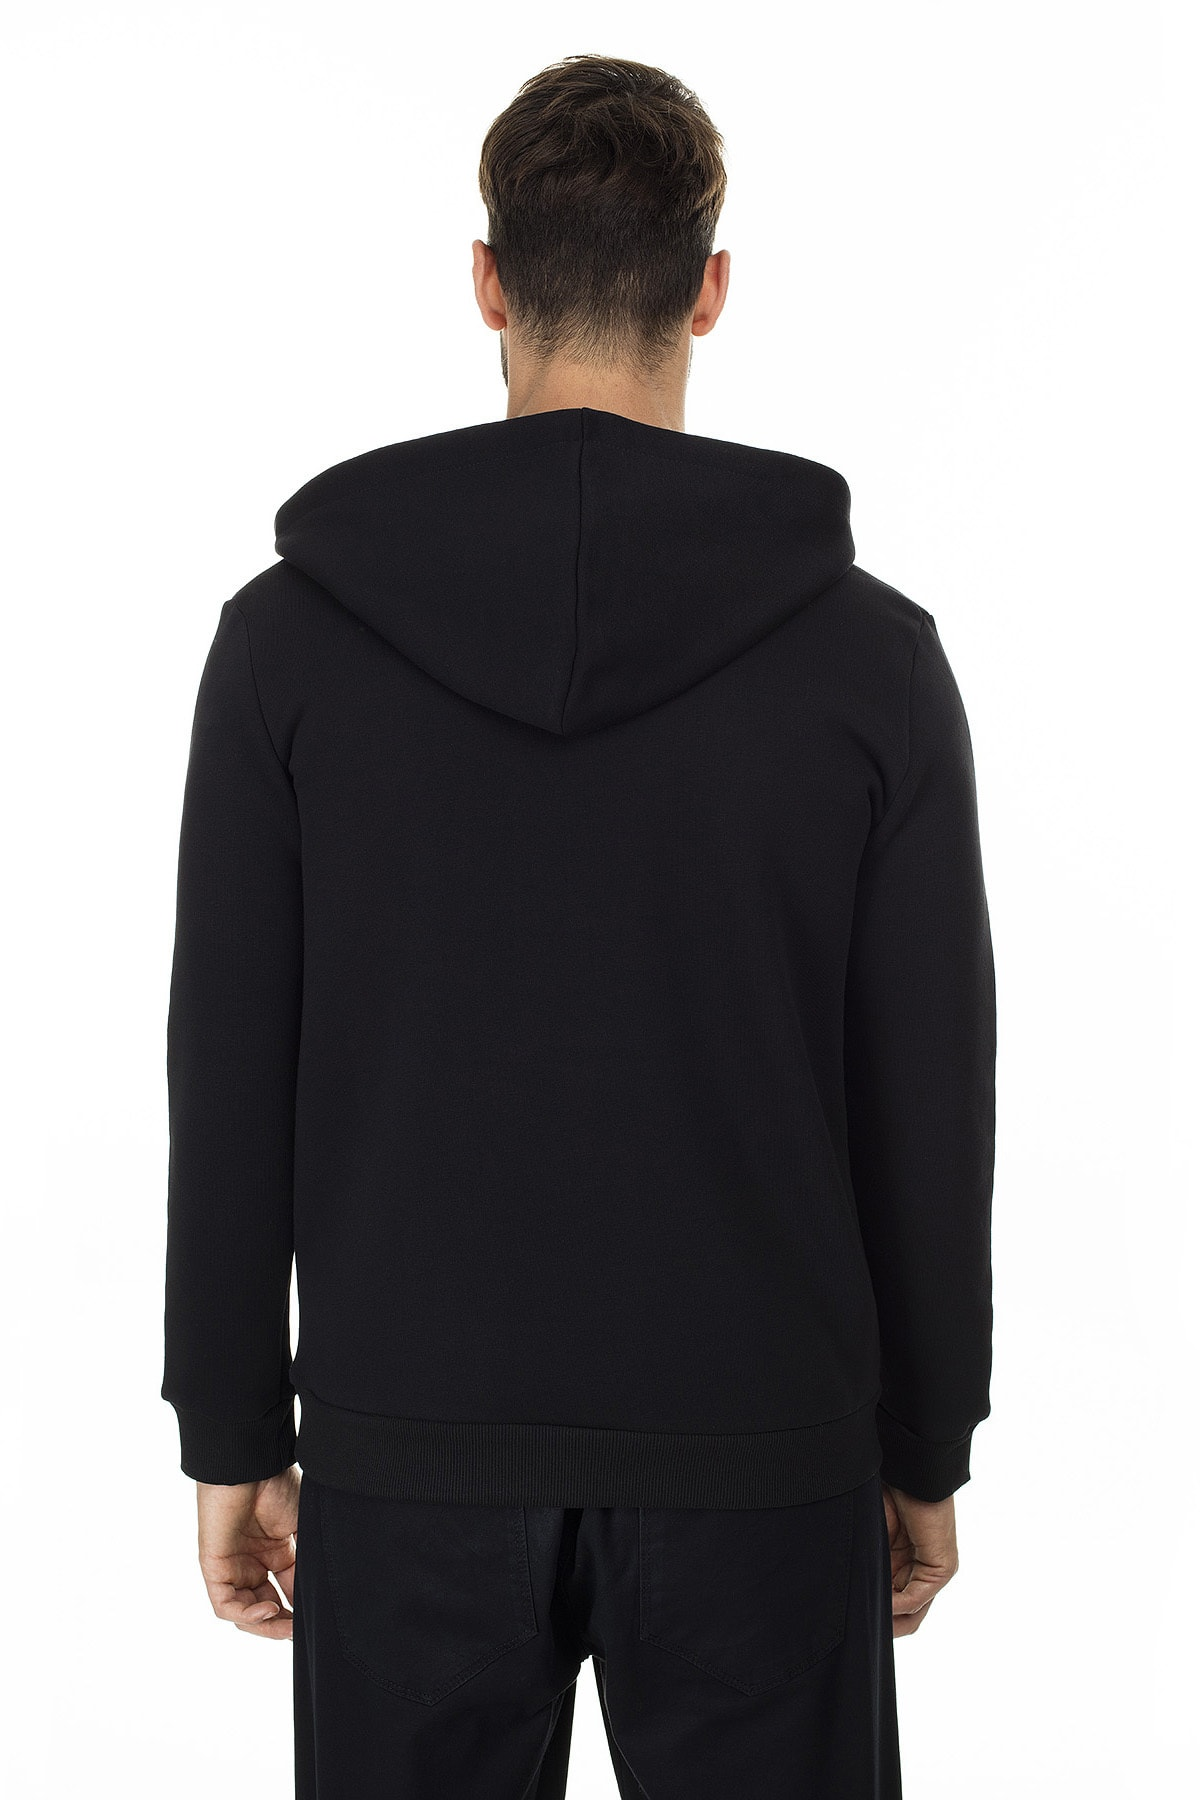 Buratti Erkek SİYAH-KIRMIZI Kanguru Cepli Fermuarlı Kapüşon Yaka Slim Fit Sweatshirt 575707 2